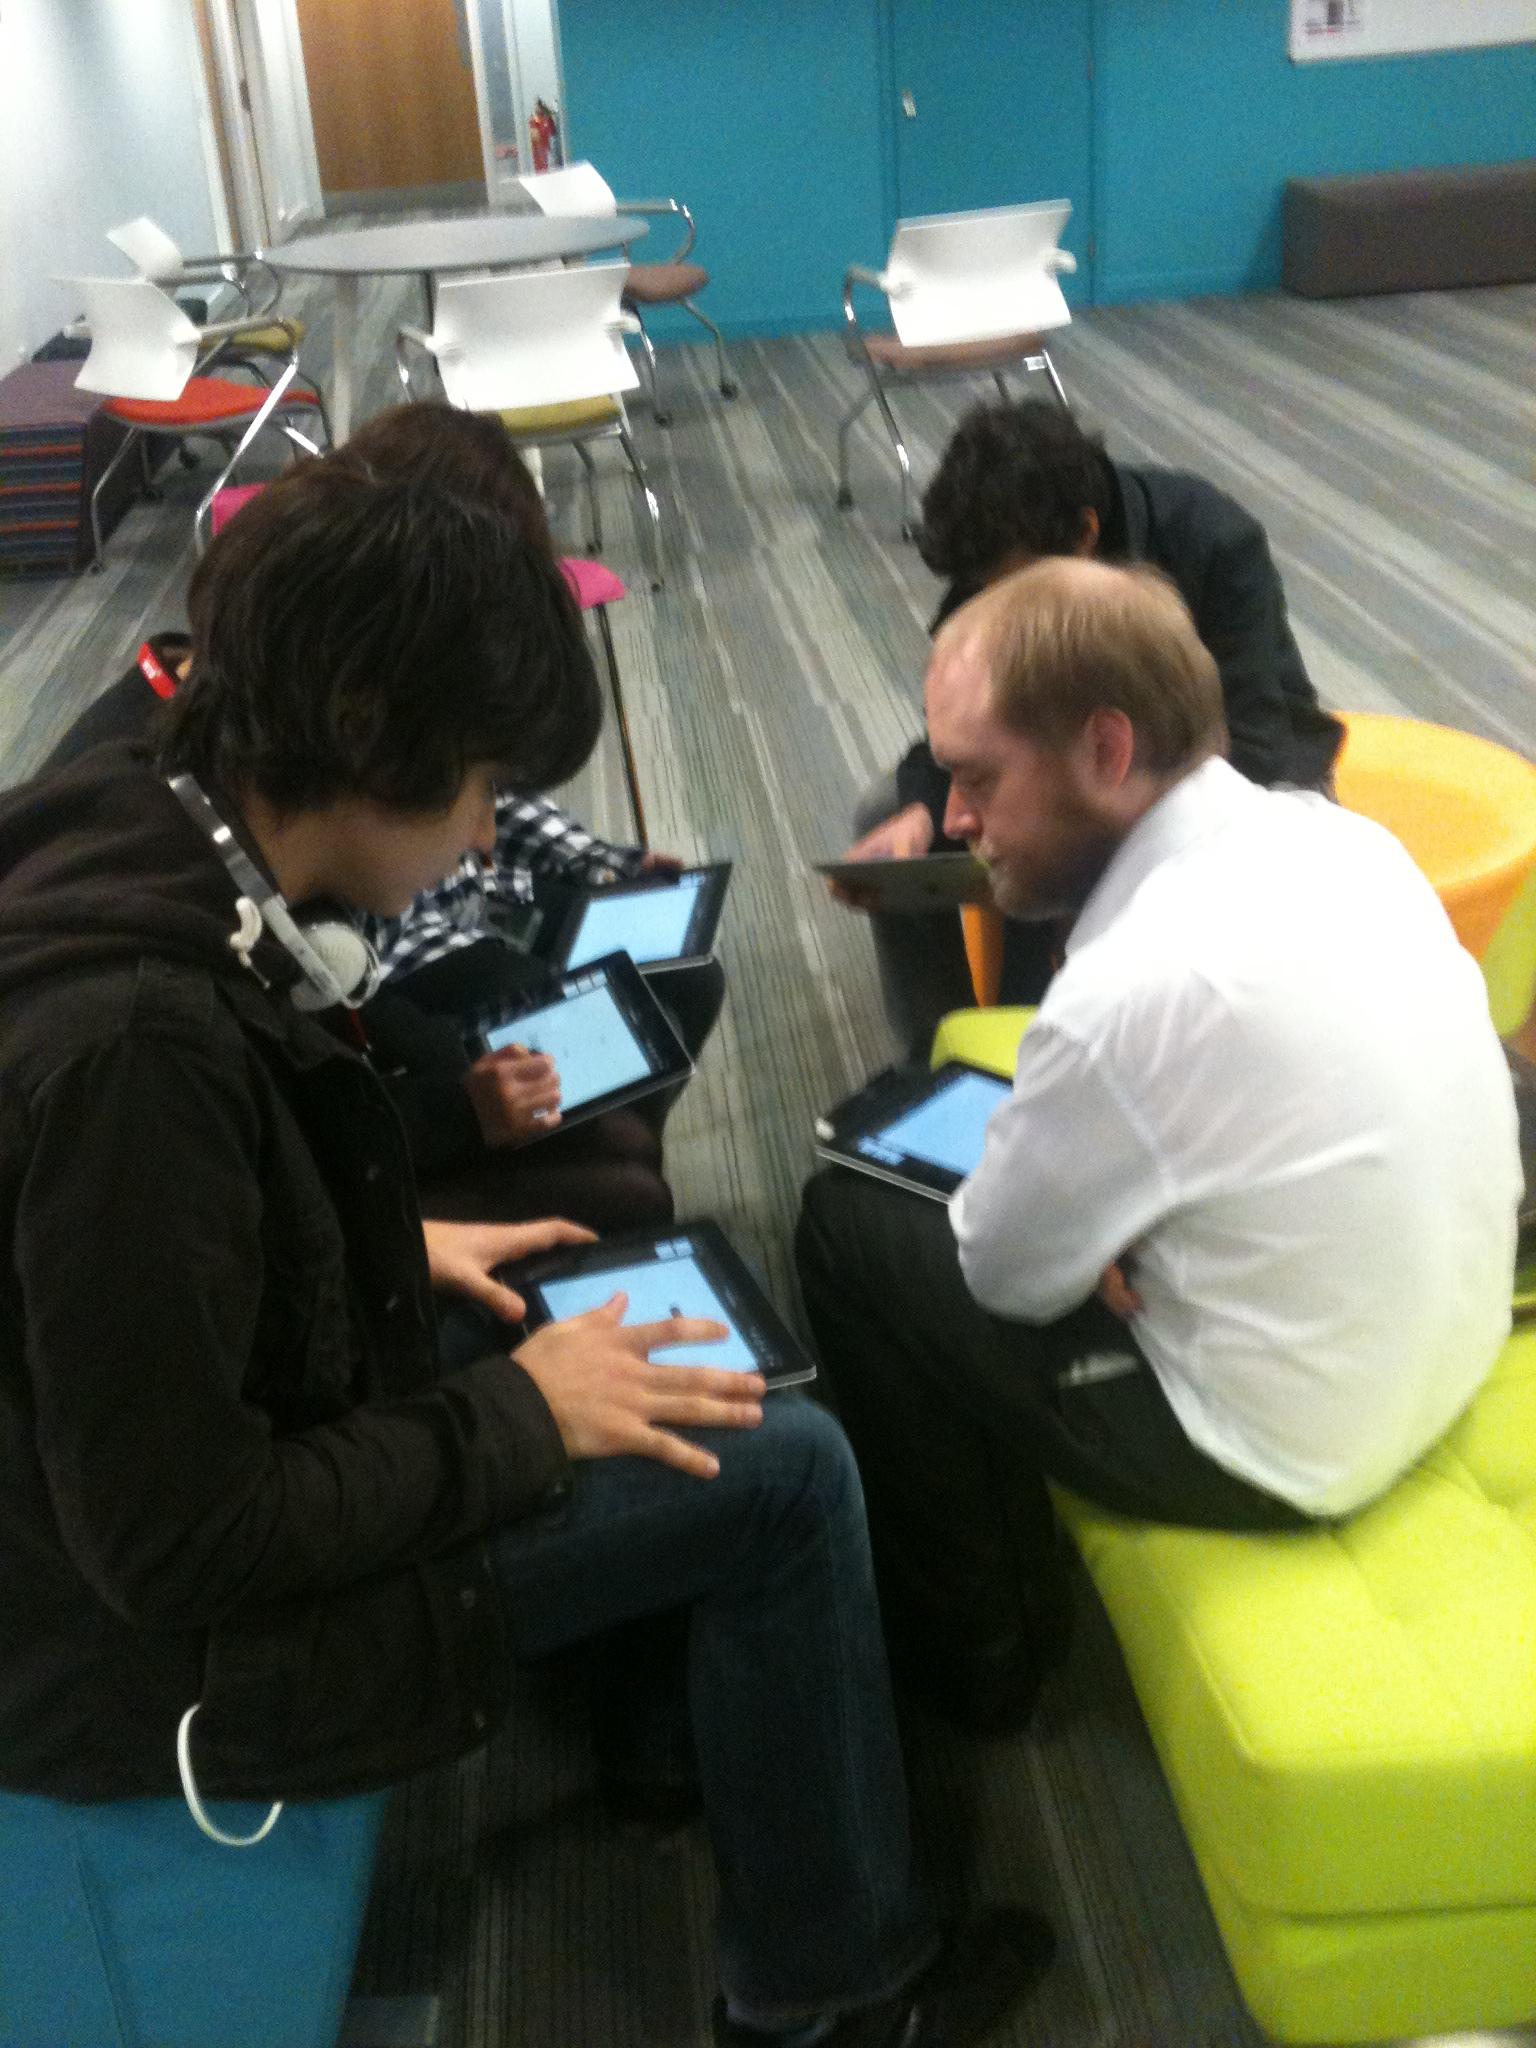 TEACHER IN PAUL BREEN'S PHD STUDY USING I PADS IN CLASSROOM